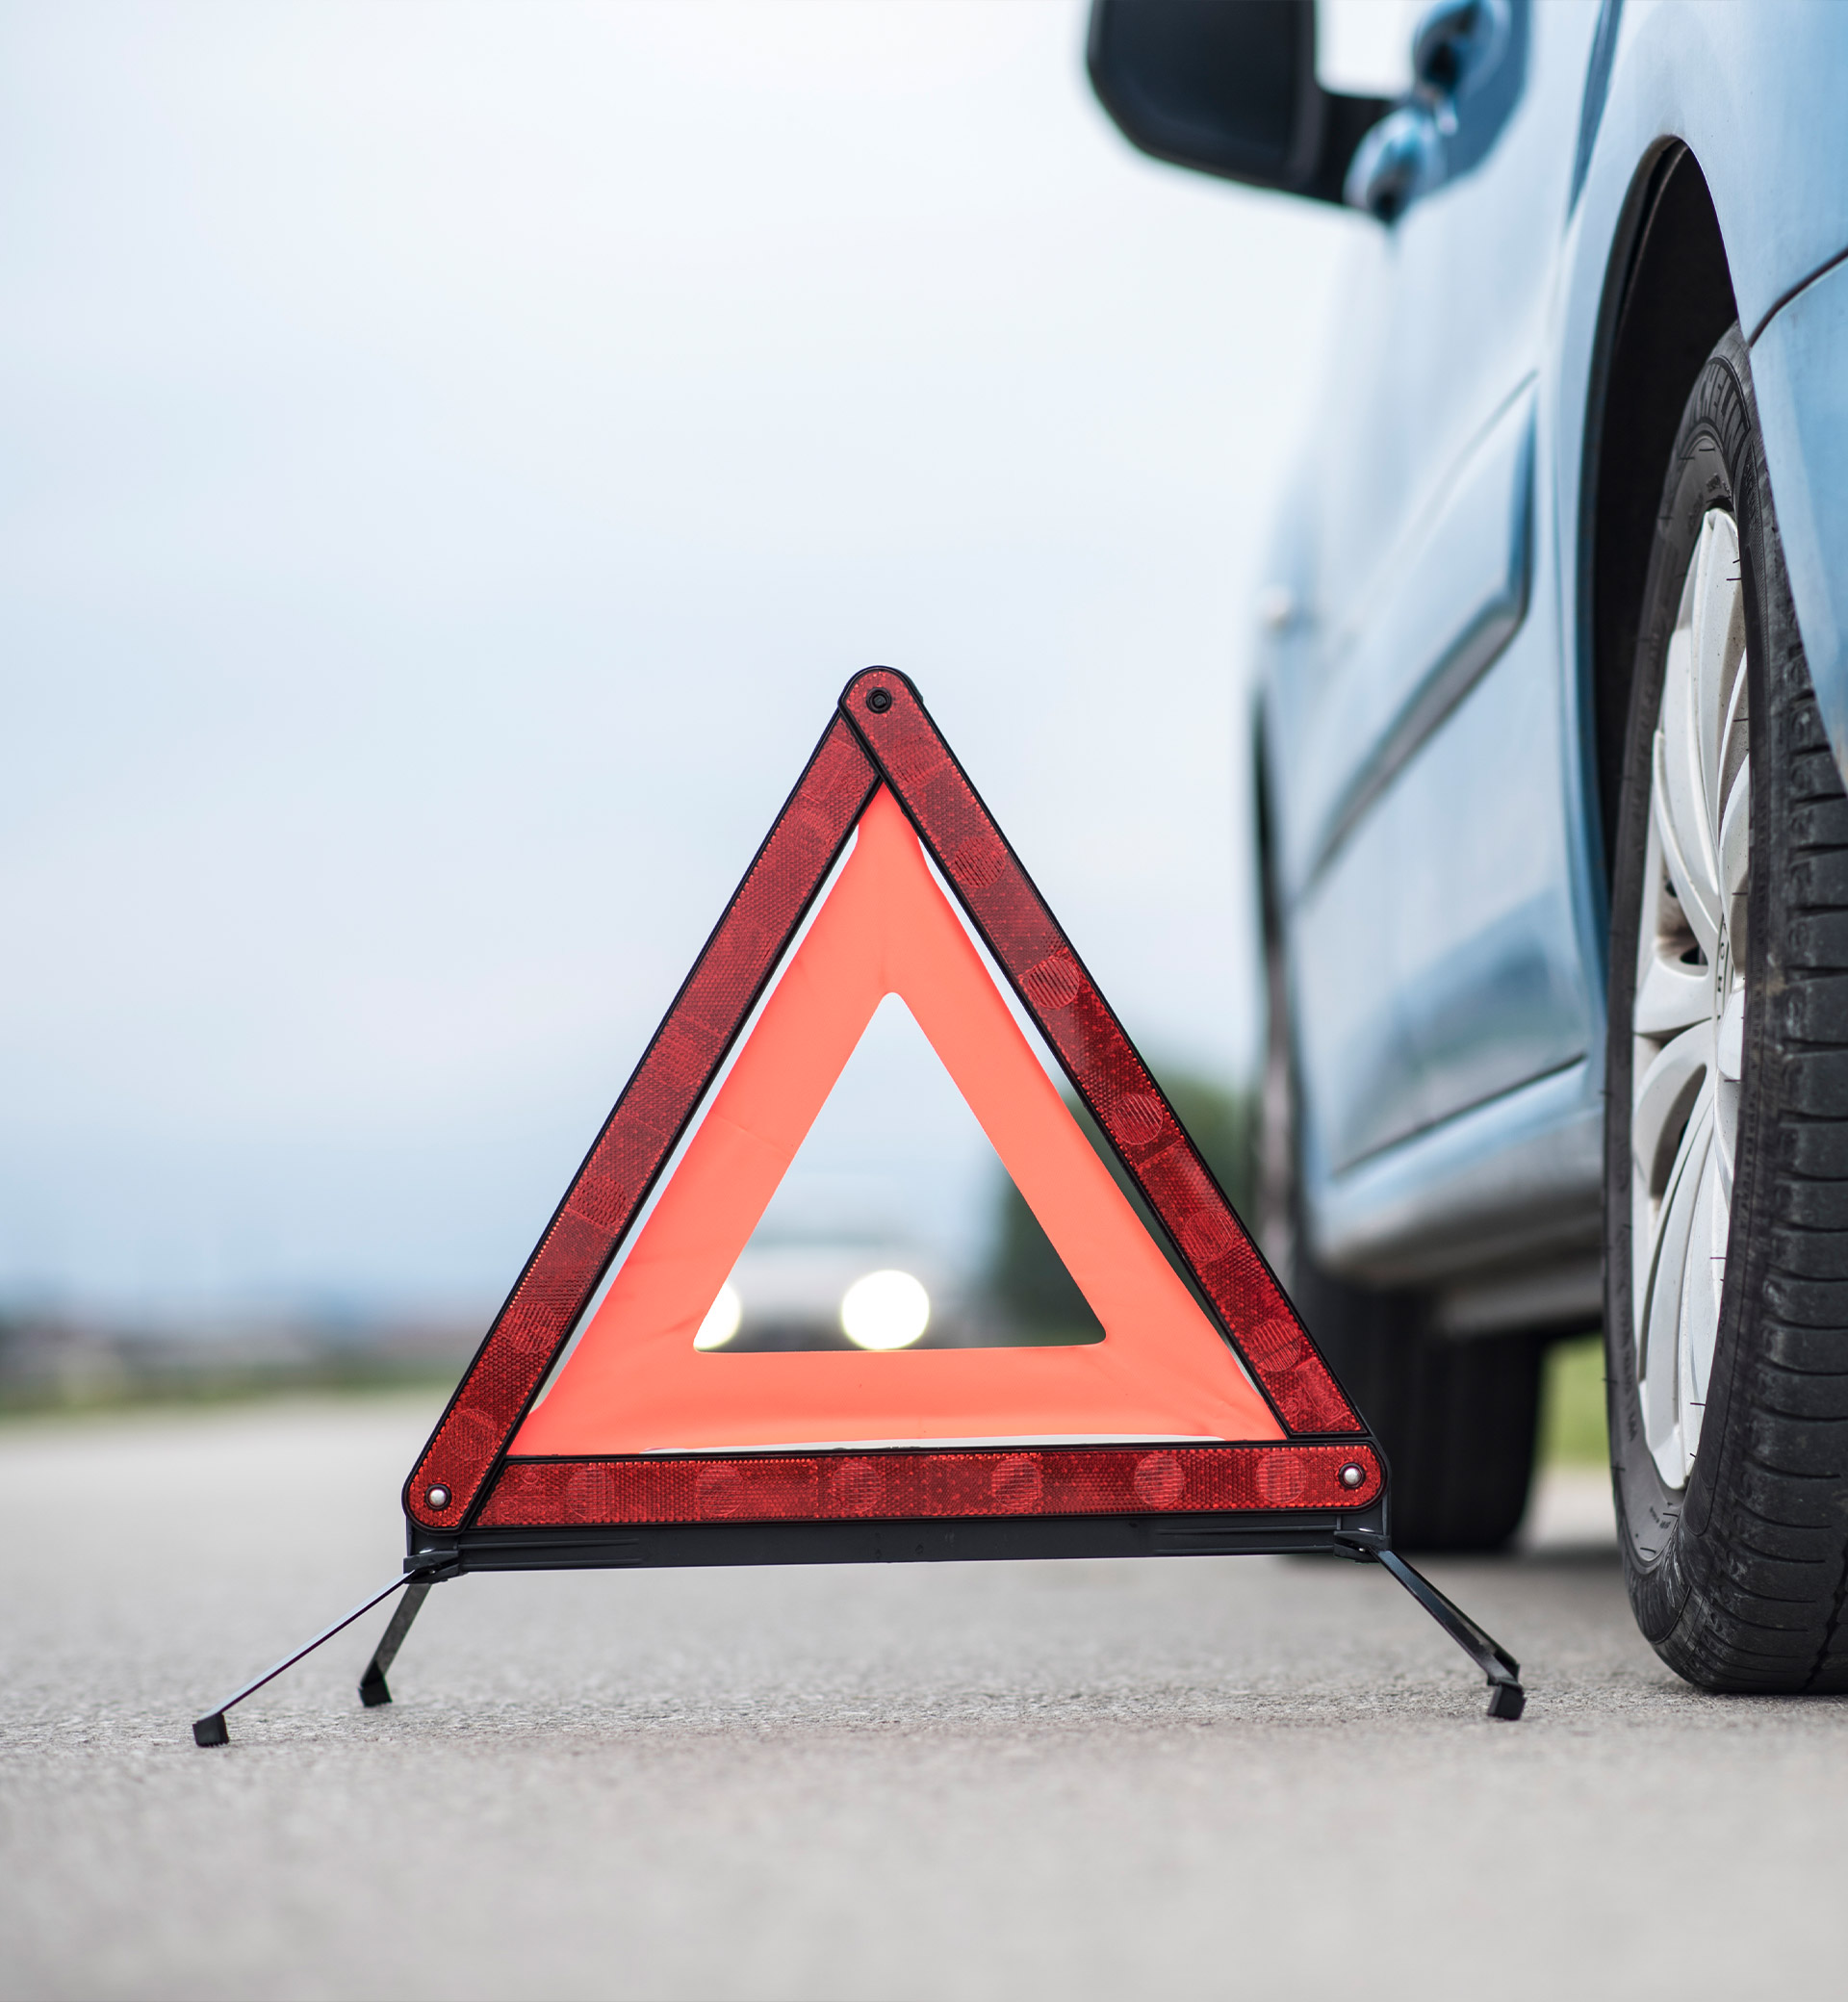 Consultas sobre accidentes